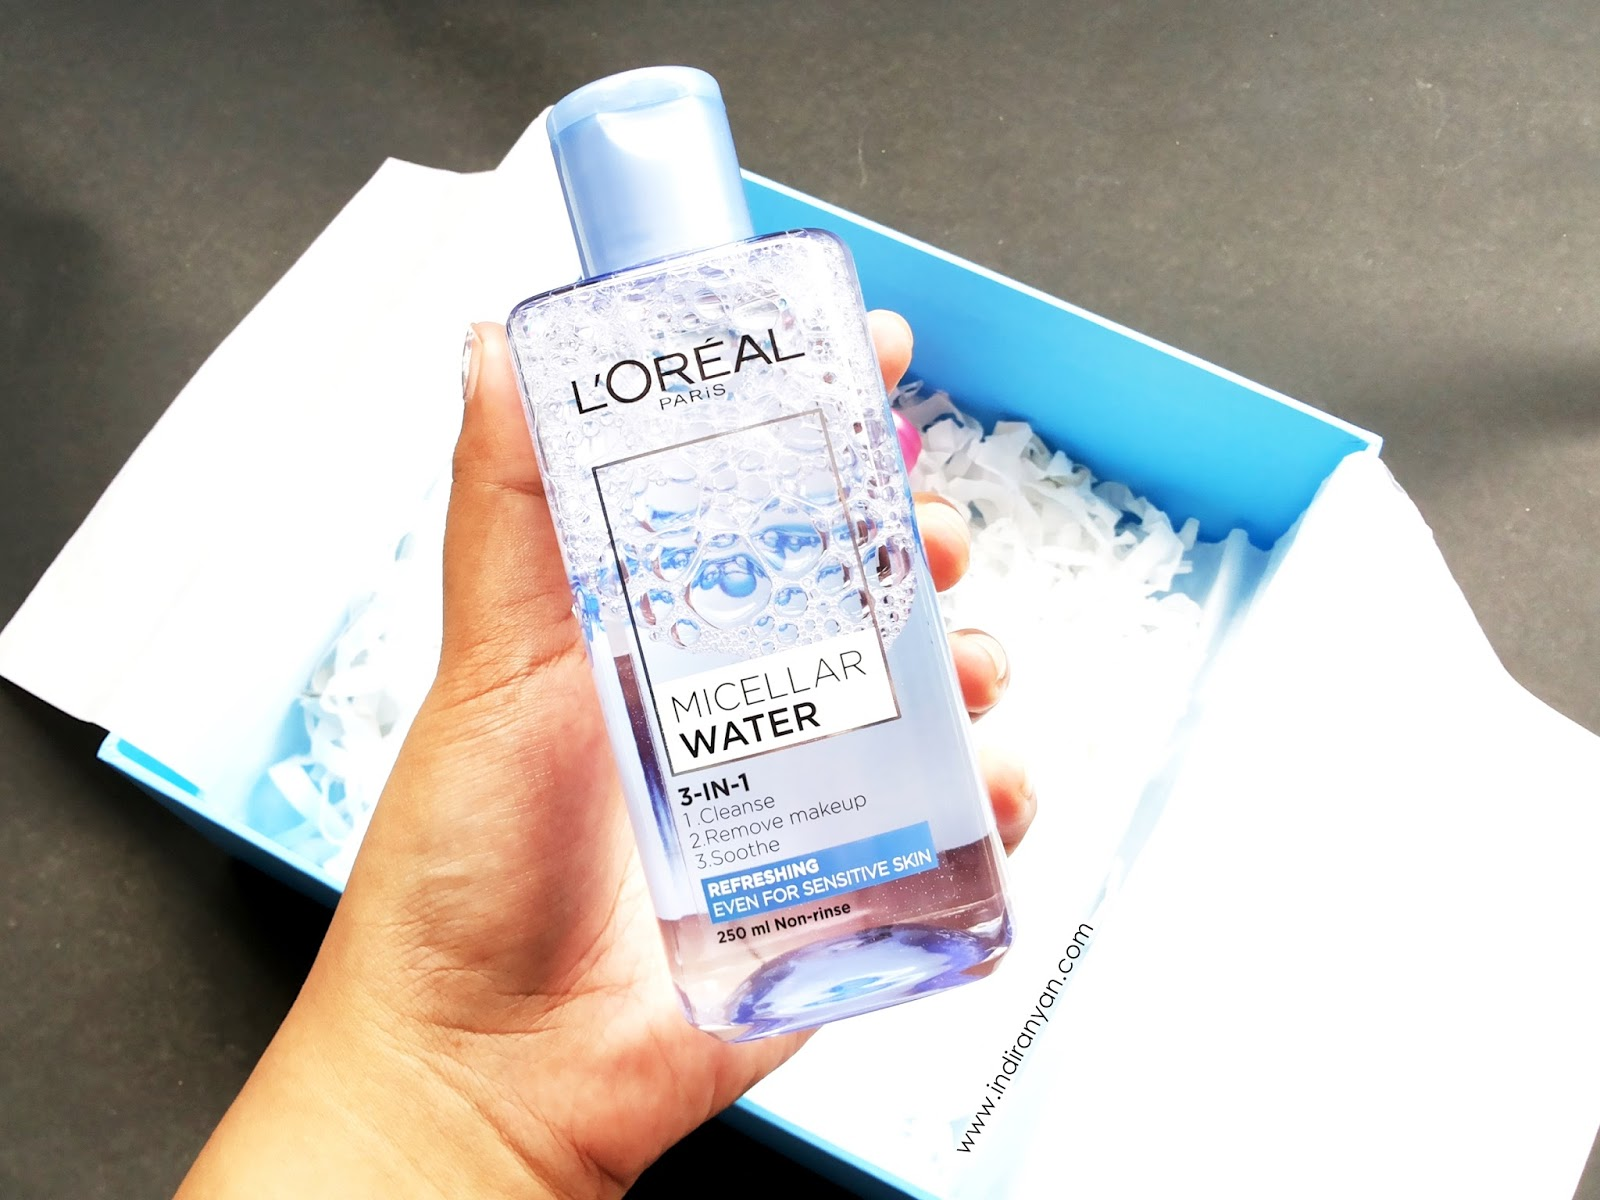 loreal-micellar-water-review, loreal-micellar-water-botol-biru, loreal-micellar-water-refreshing